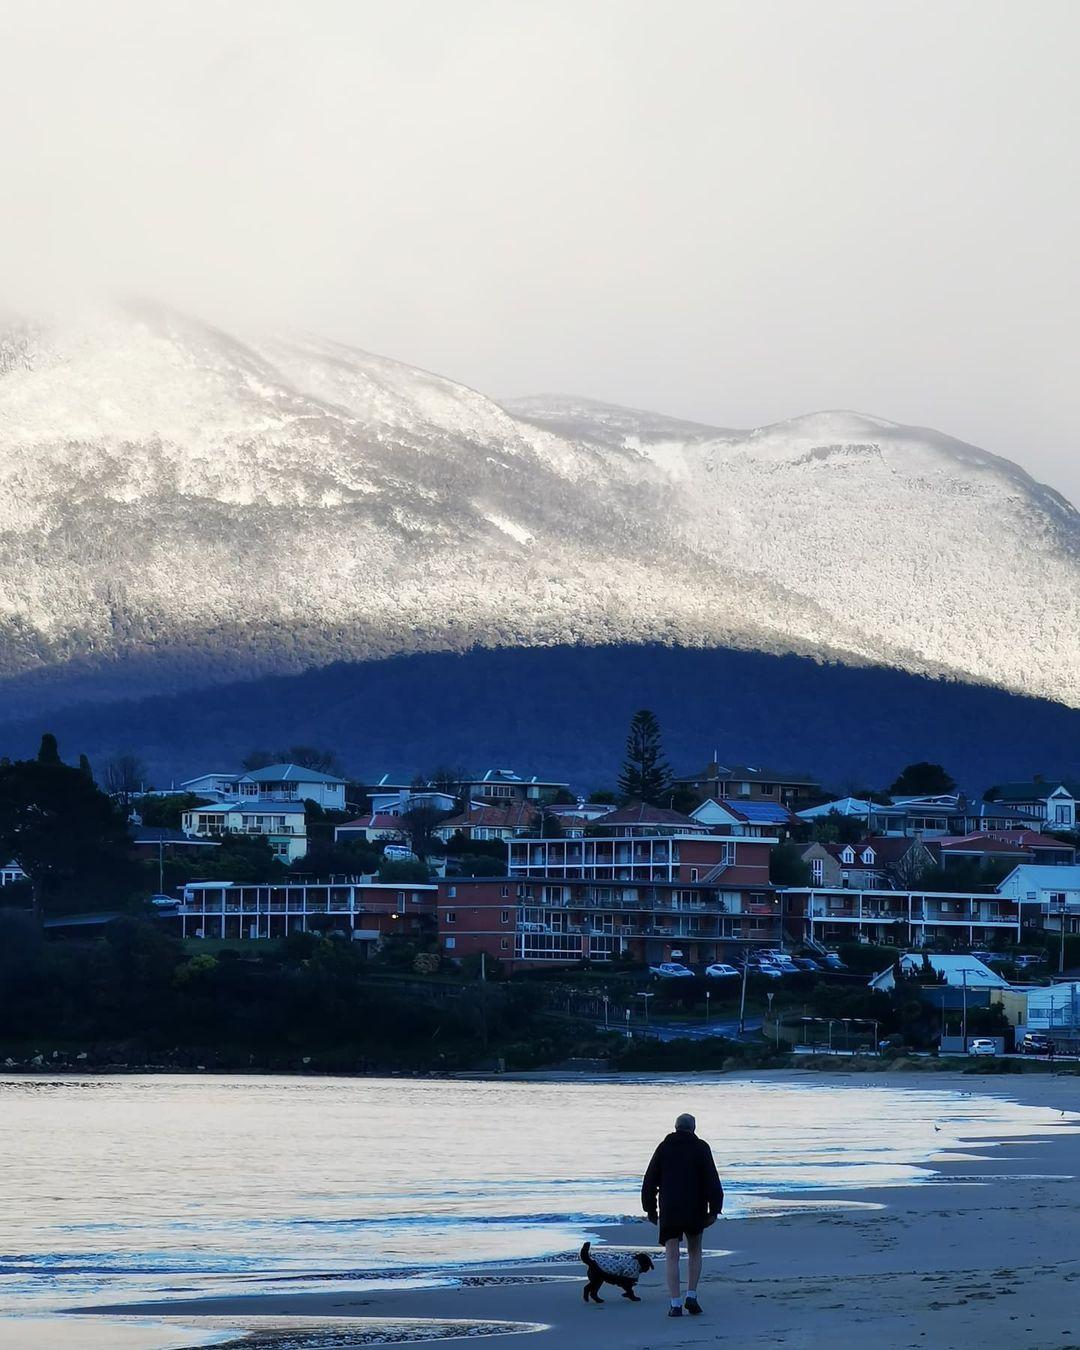 Snow on kunanyi/Mt Wellington seen from Bellerive beach, Tasmania. August 2021